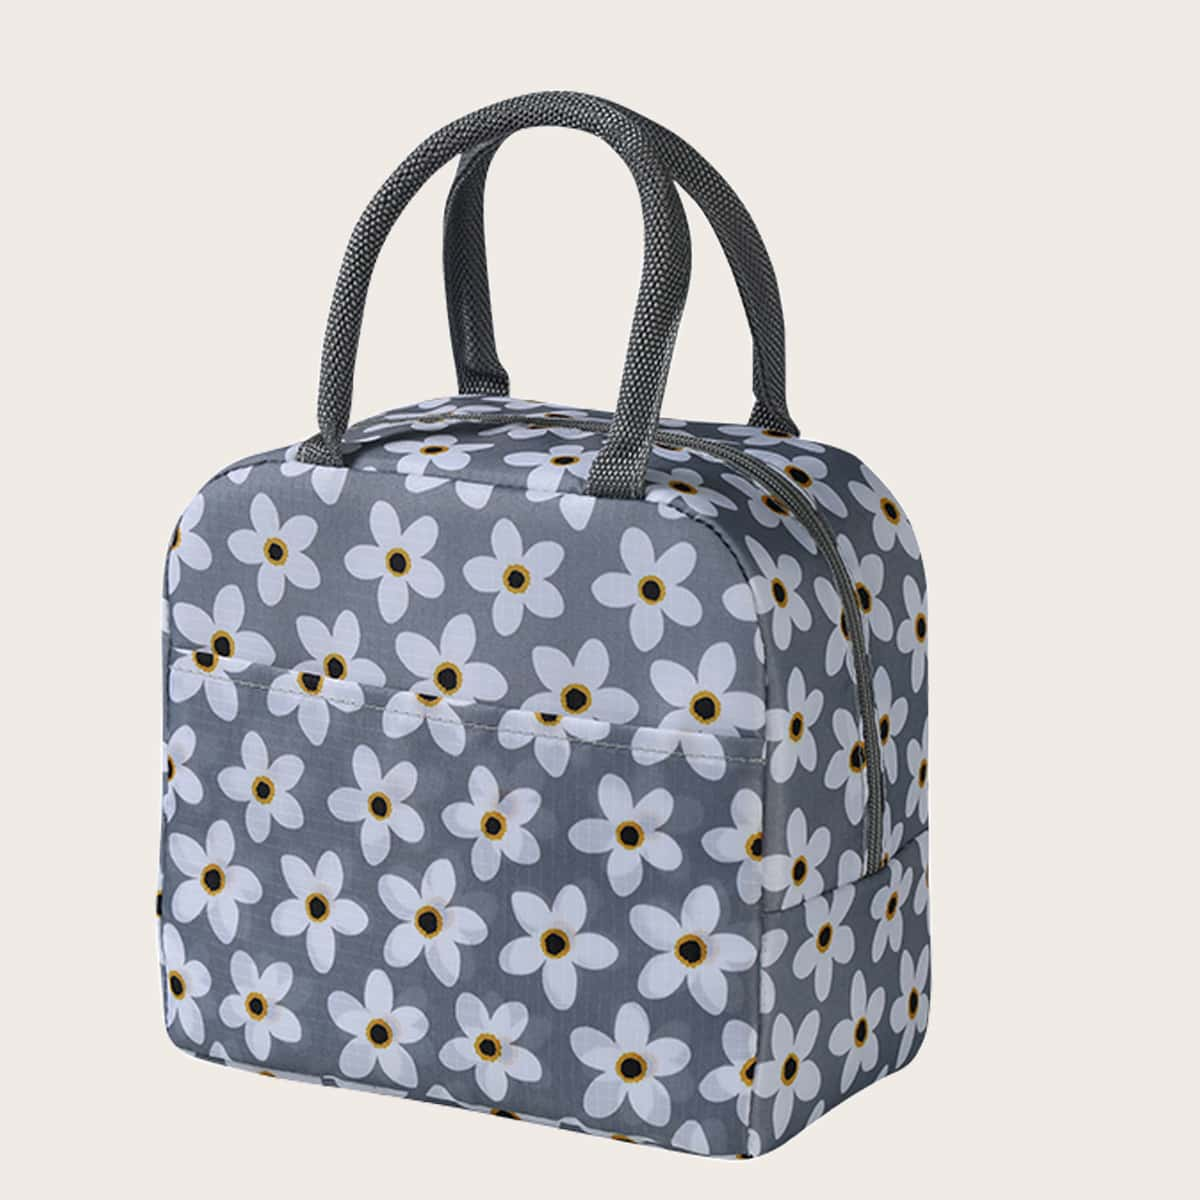 SHEIN / 1pc Flower Print Lunch Bag